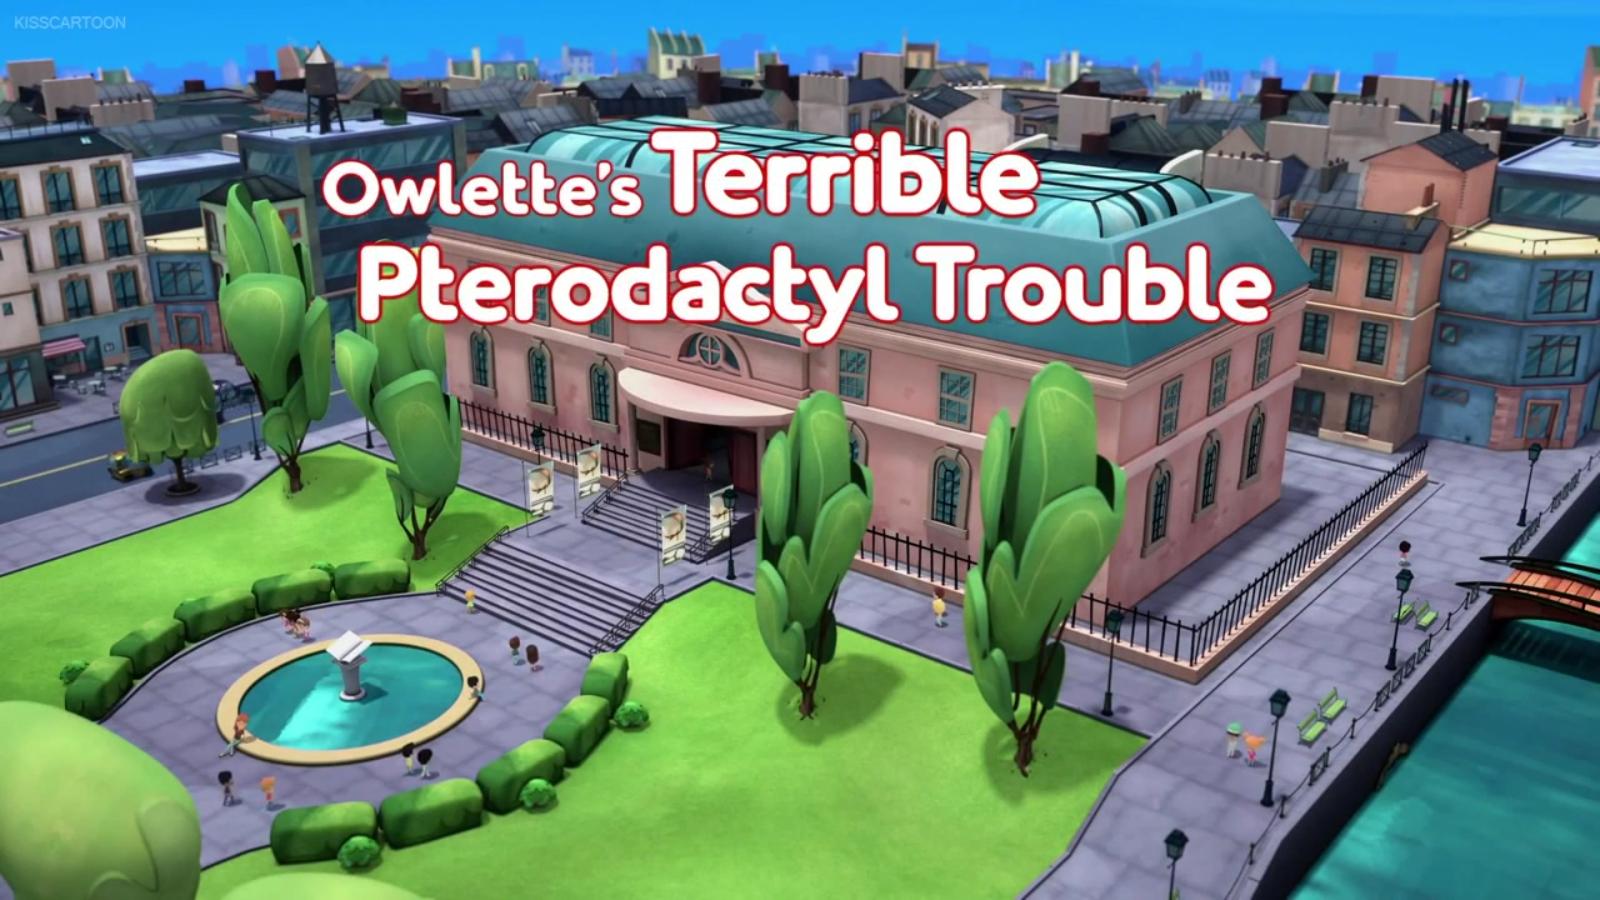 Owlette's Terrible Pterodactyl Trouble